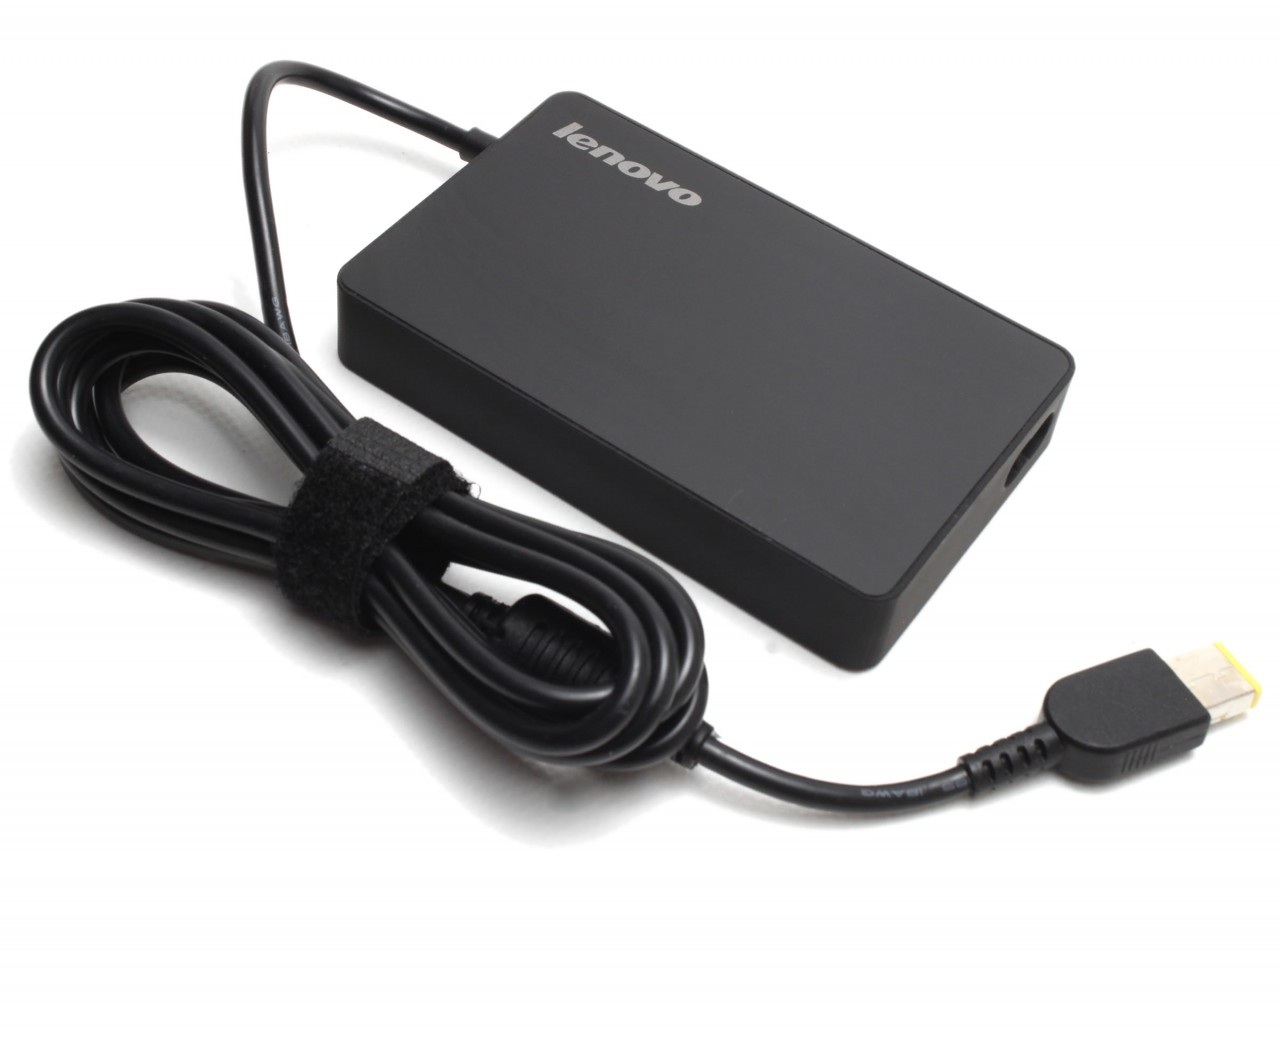 Incarcator Lenovo ThinkPad S440 65W Slim Version imagine